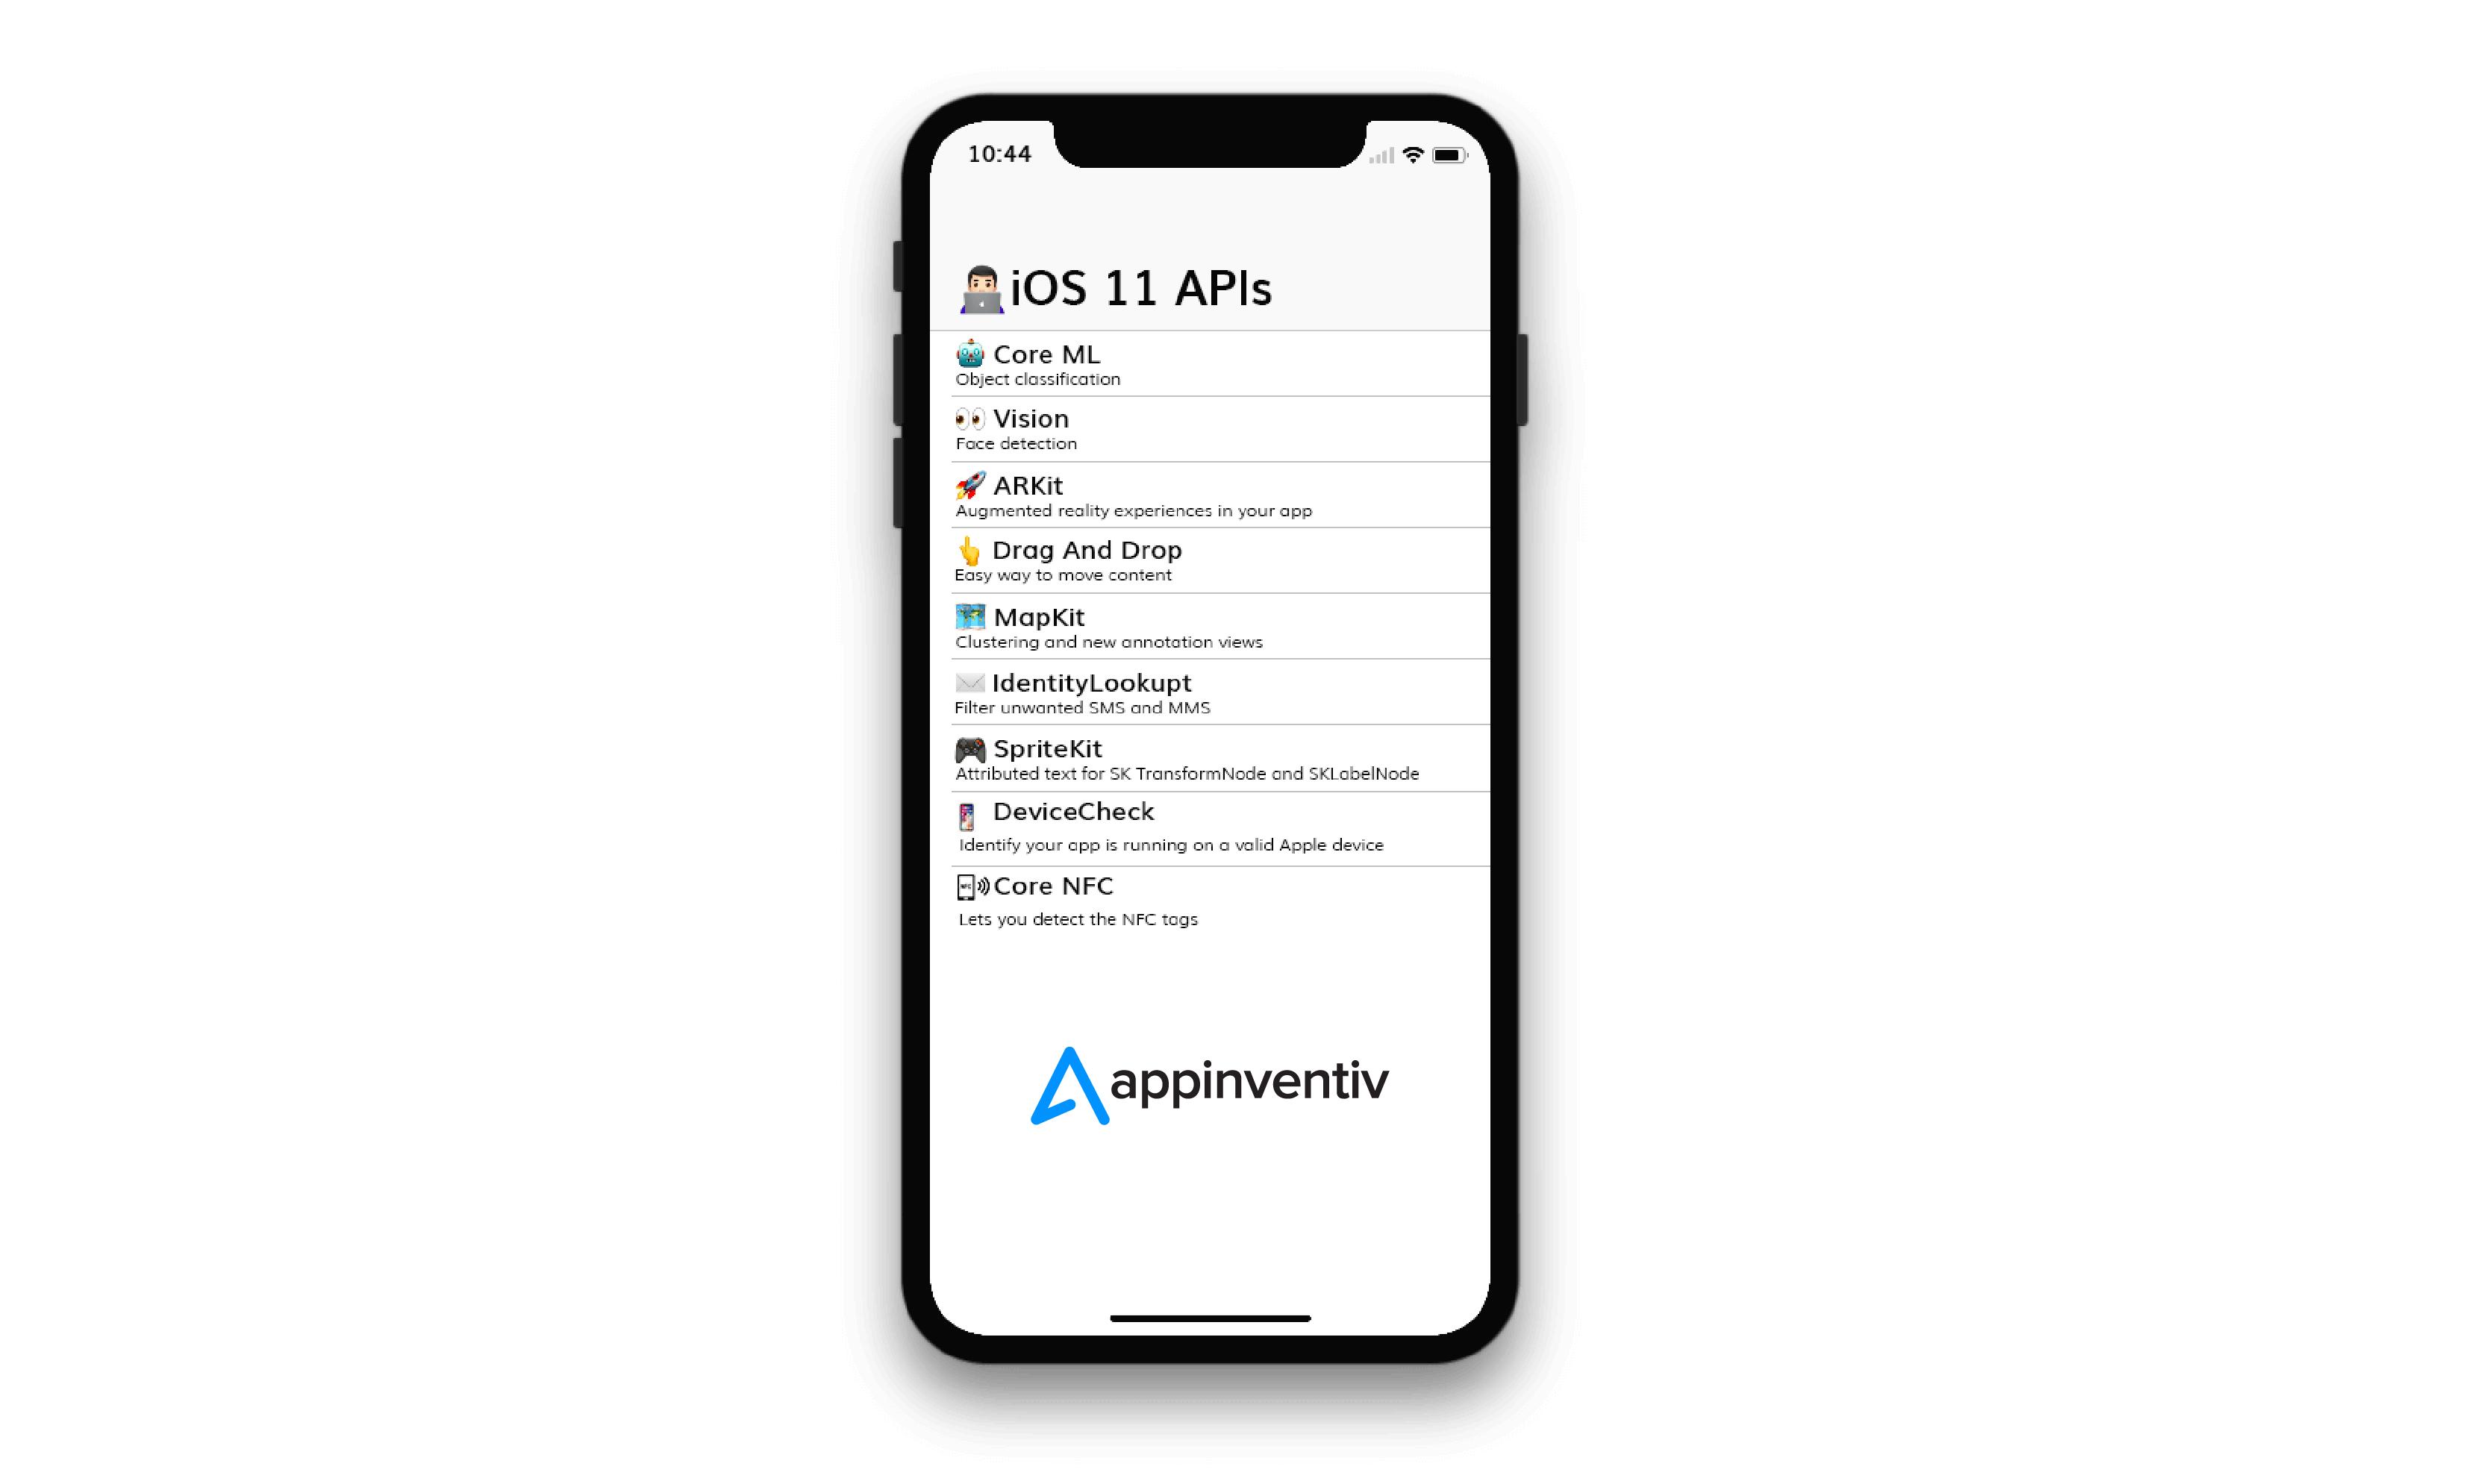 The Nine iOS 11 APIs